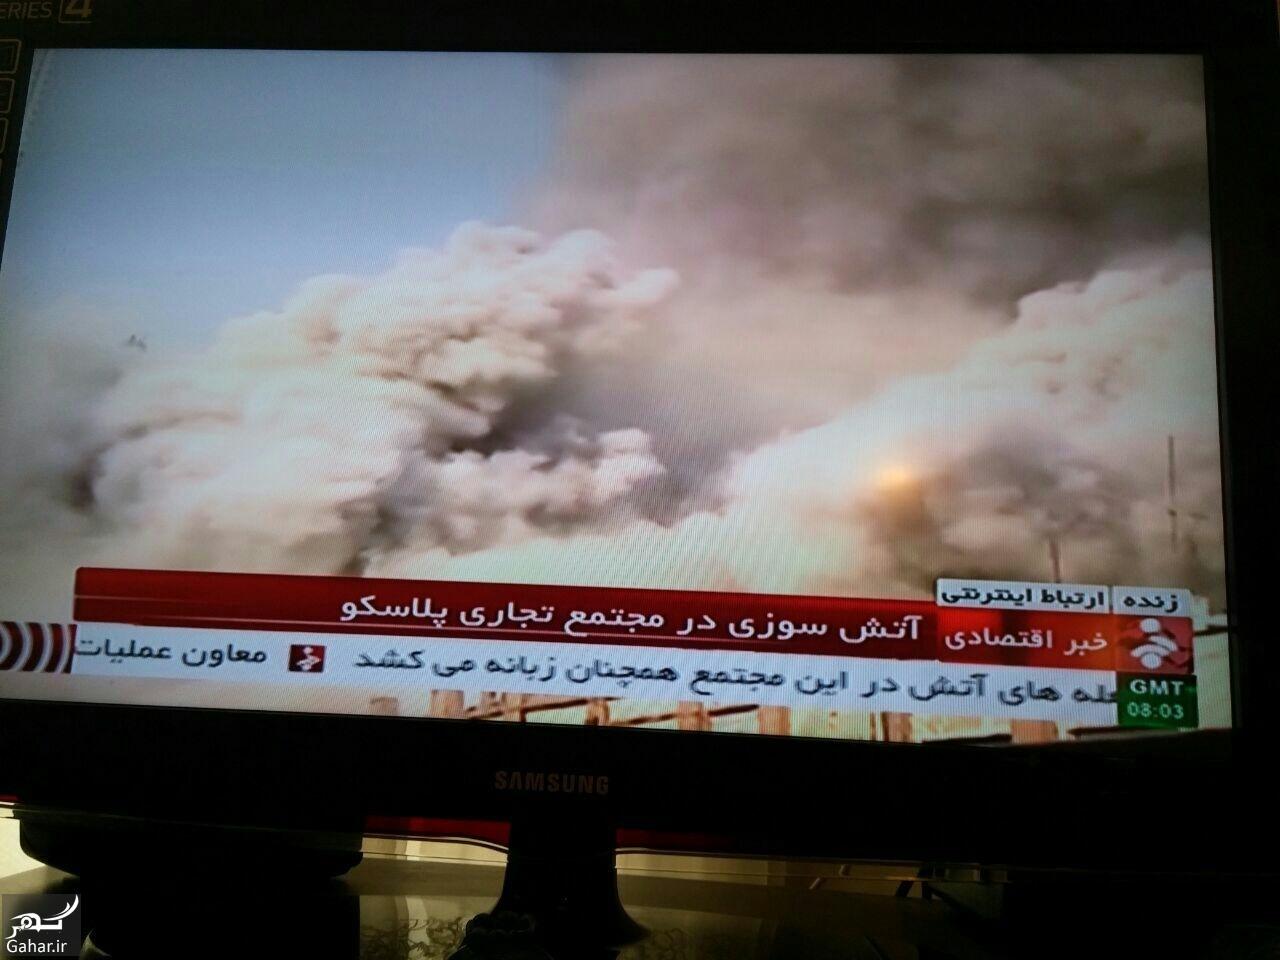 pelasko ساختمان پلاسکو تهران پس از آتش سوزی فرو ریخت + فیلم